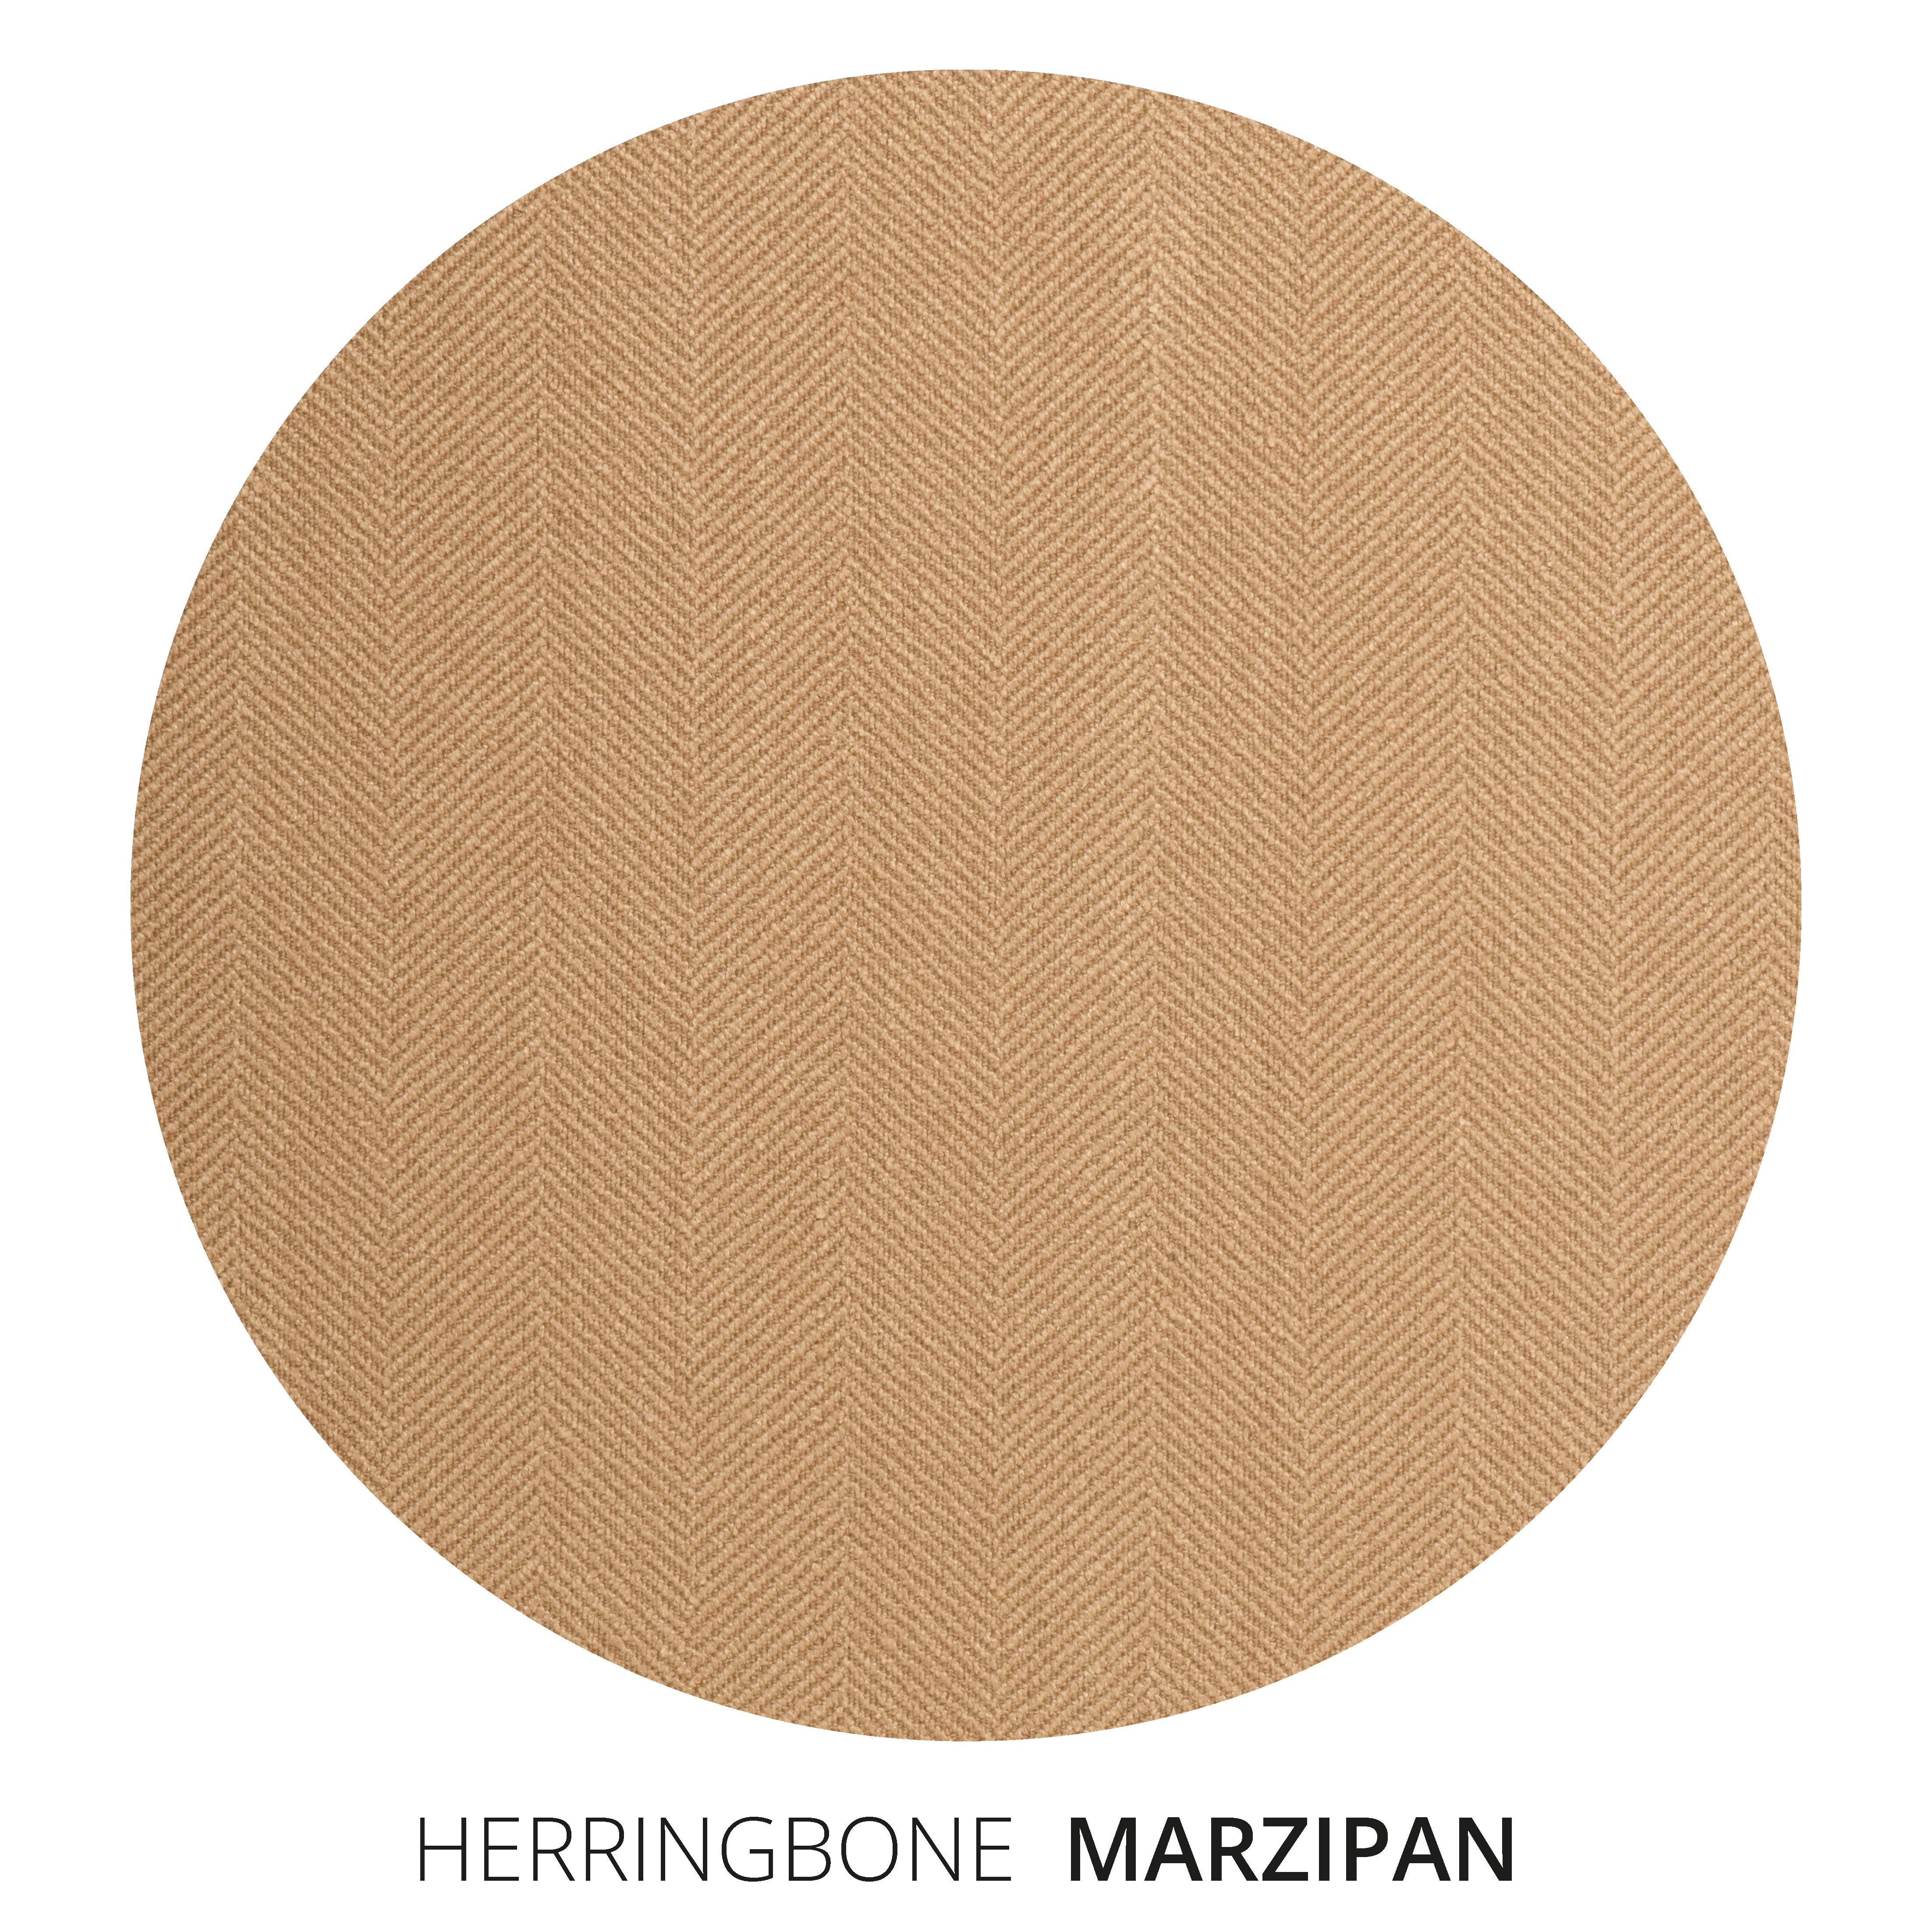 Marzipan Herringbone Swatch